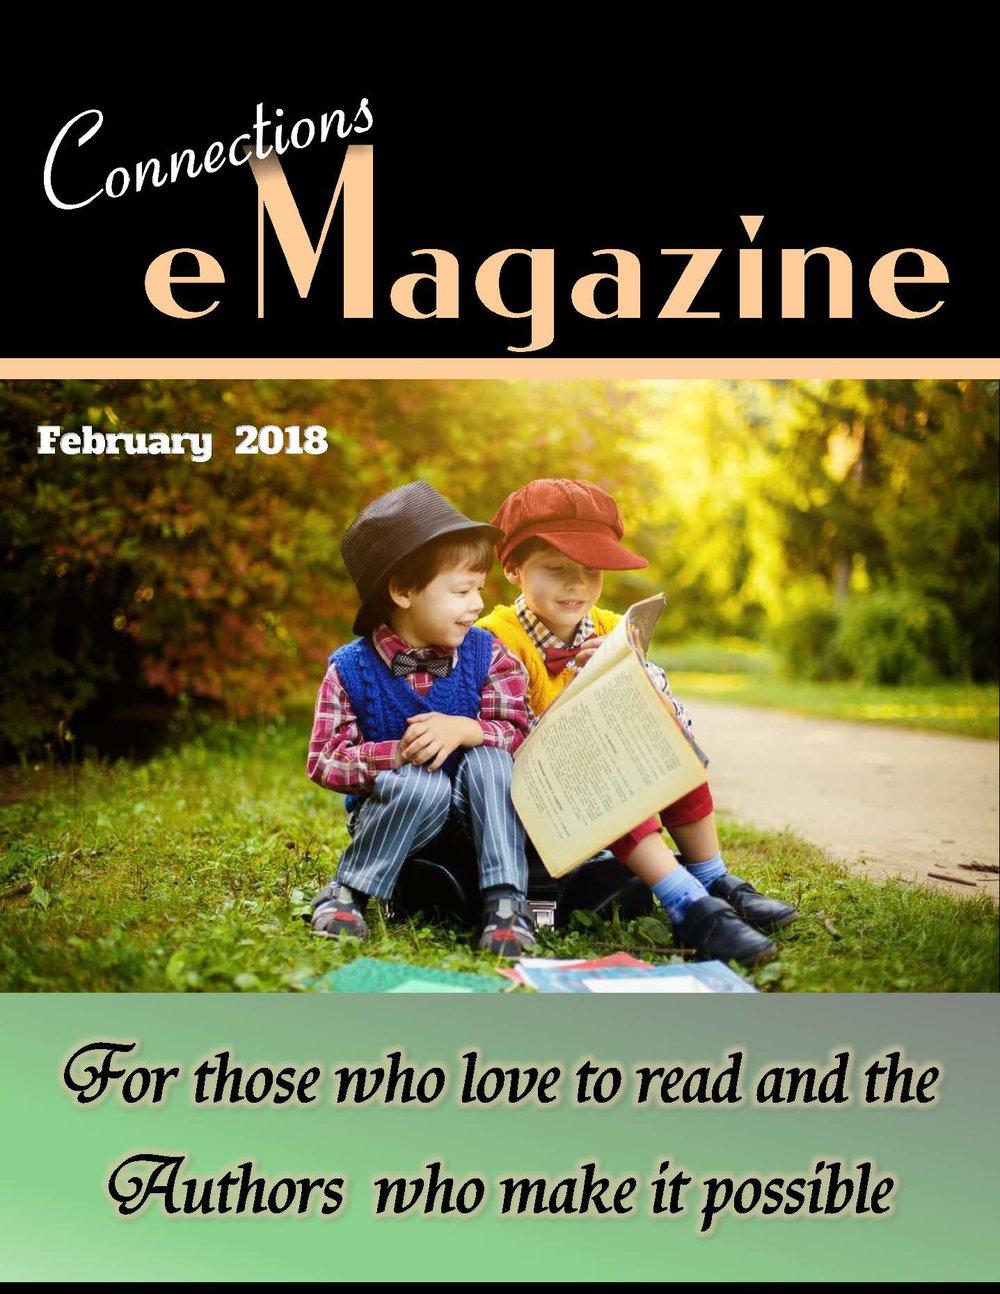 mpsmith-publishing-connections-emagazine-february-2018_Page_001.jpg